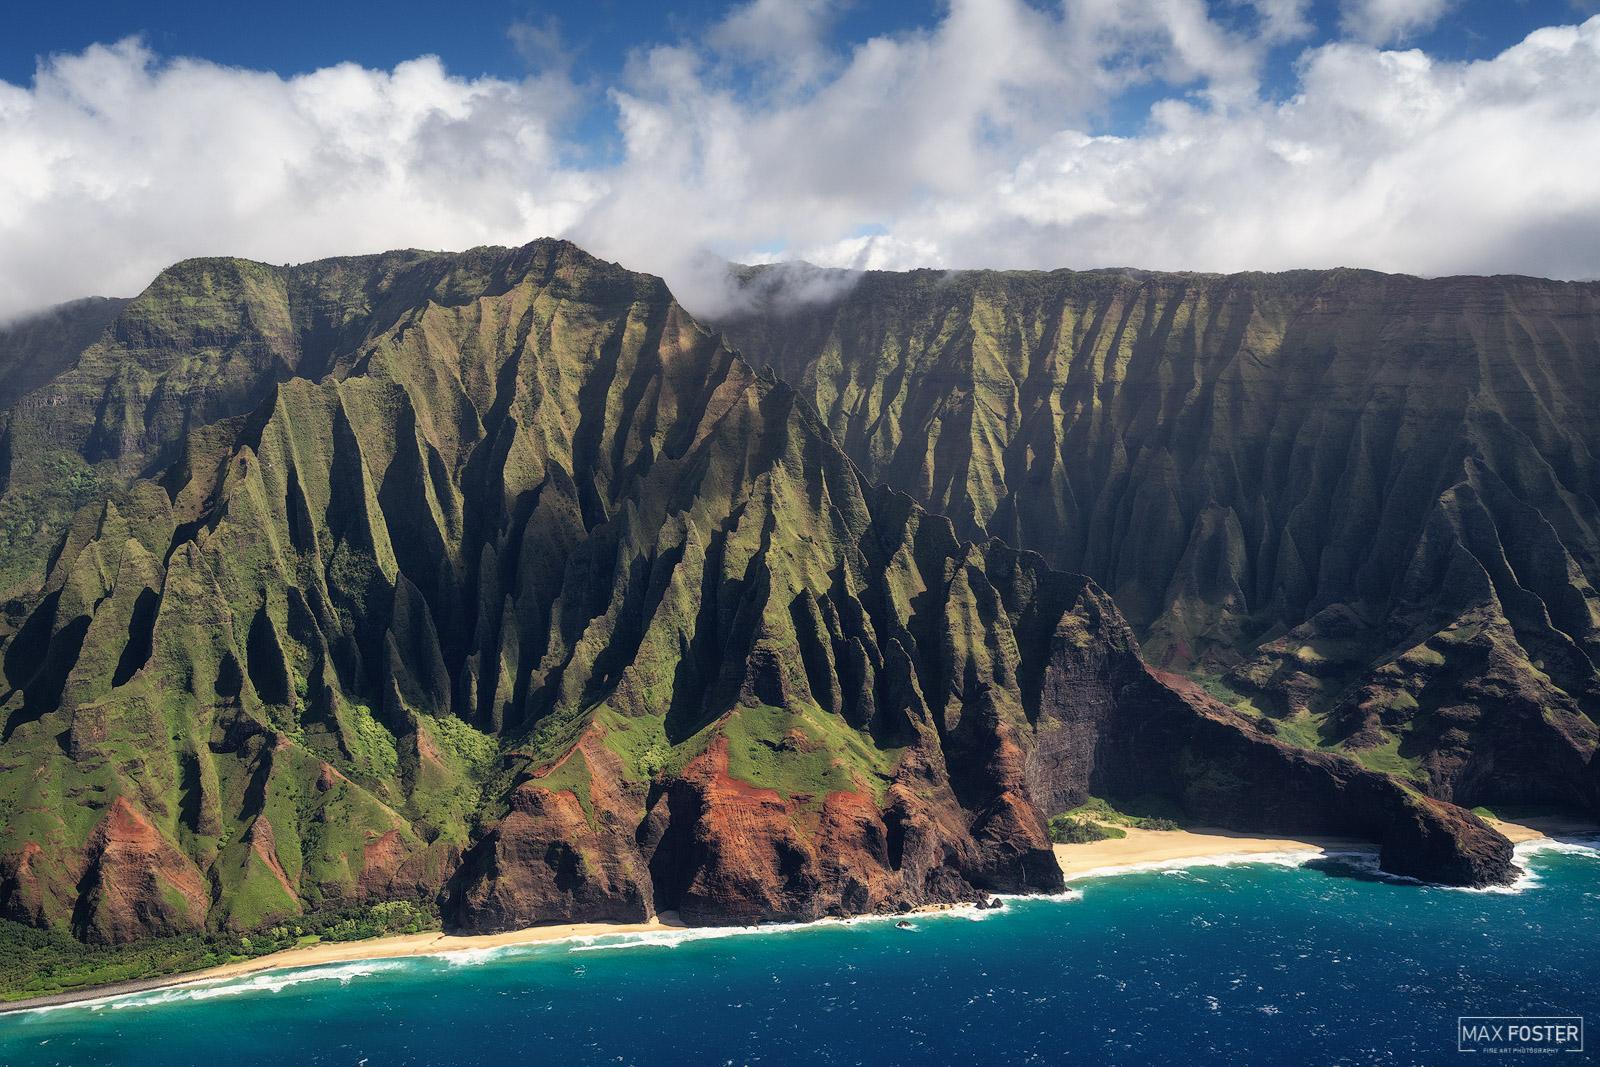 Fine Art Limited Edition of 50 The Hawaiian Kingdom, or Kingdom of Hawaiʻi, was an independent state on the Hawaii Islands....